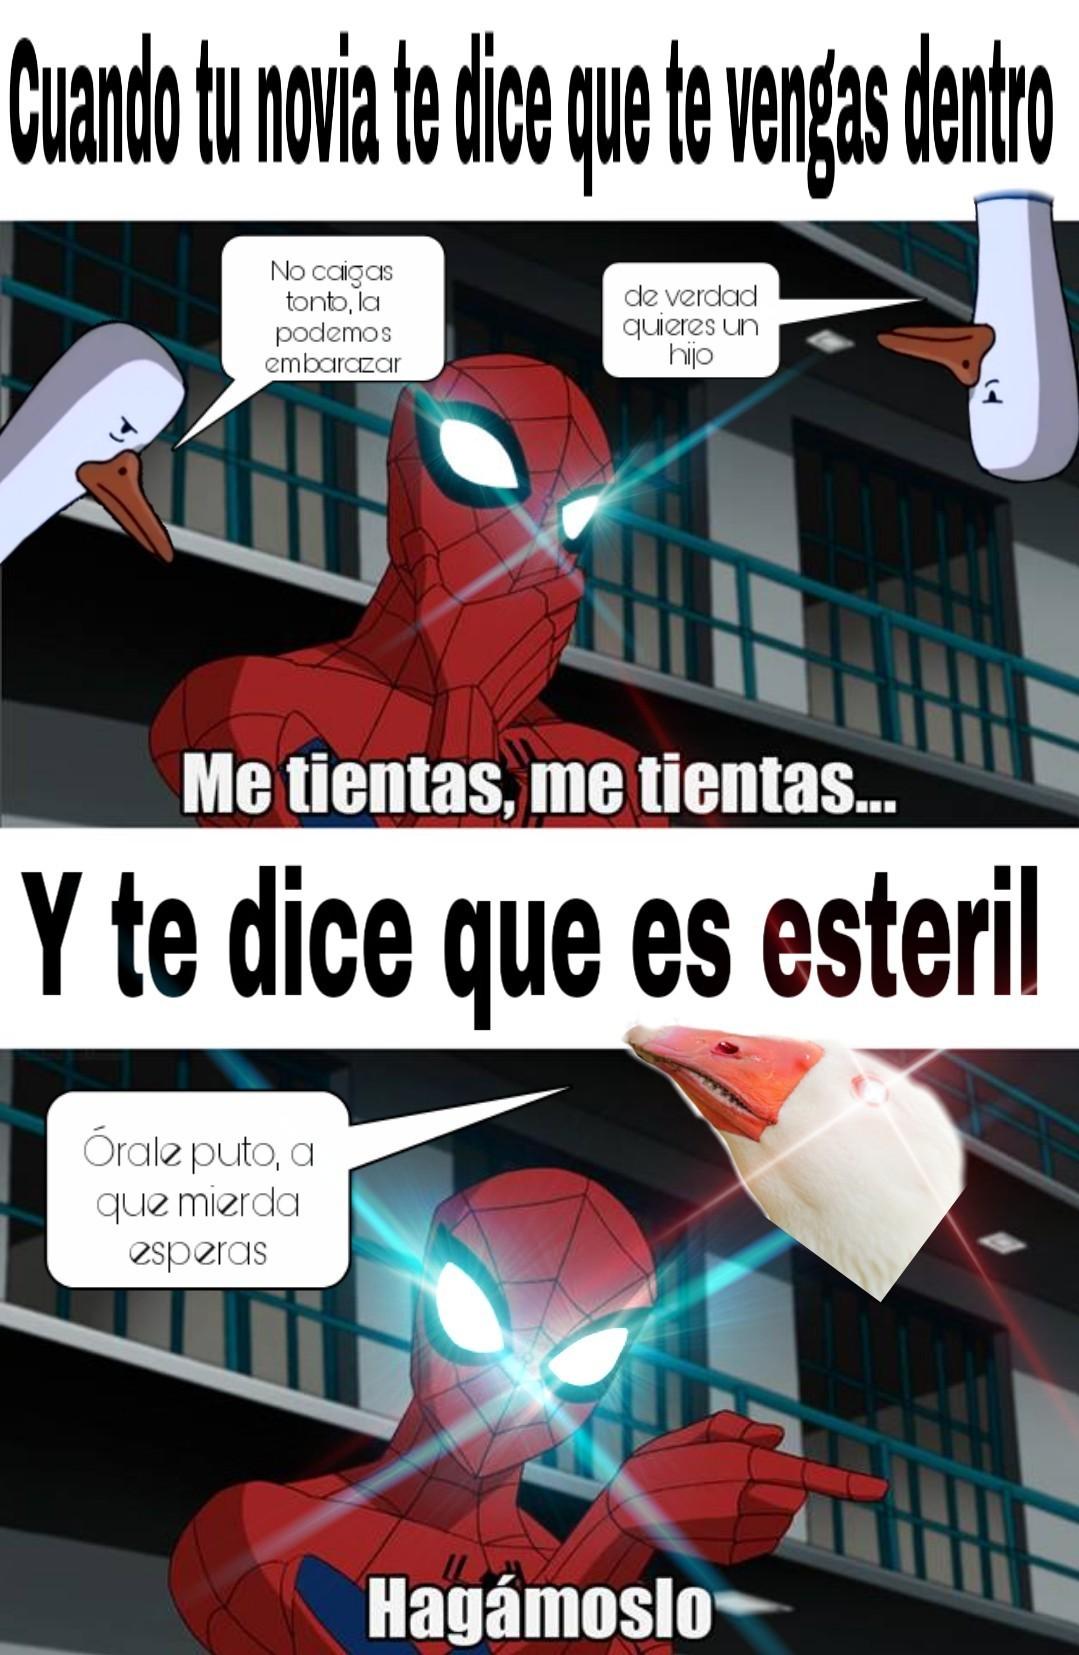 The amazing Ganso araña - meme